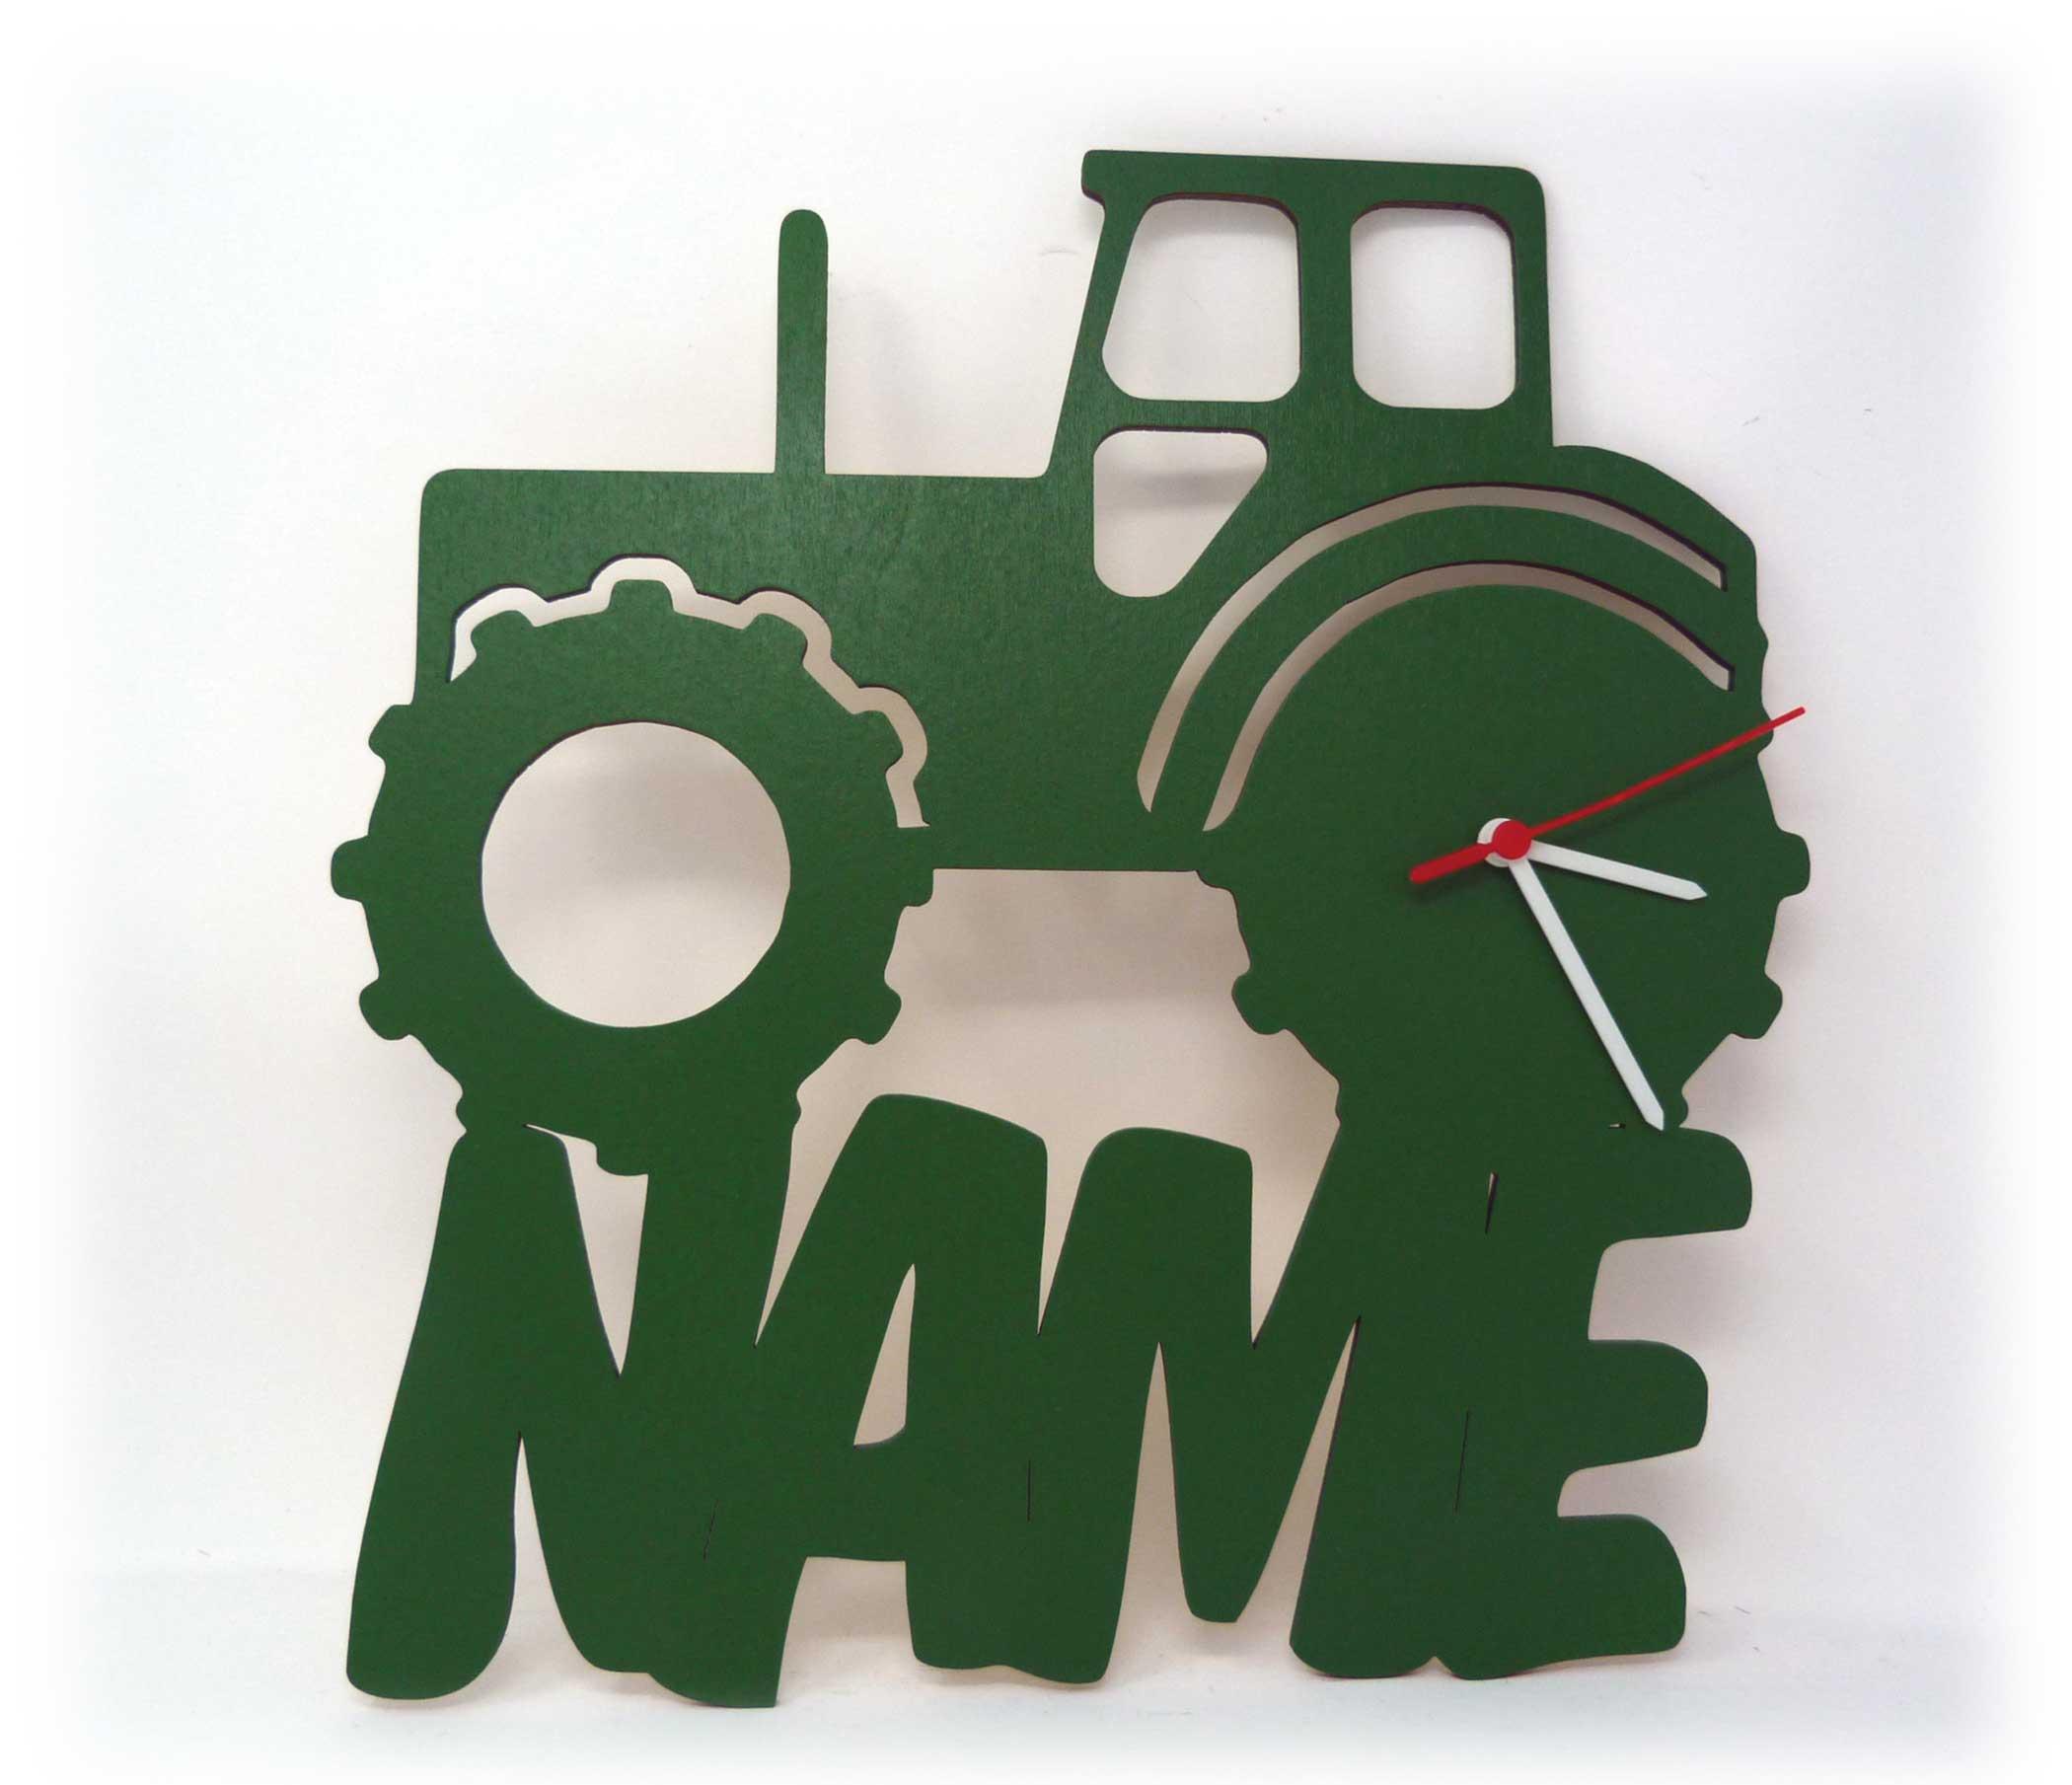 a070998869 ... Kinderzimmergeeignet · Vorschau: Traktor Geschenke für Männer. Traktor  Uhr Geschenke Kinder